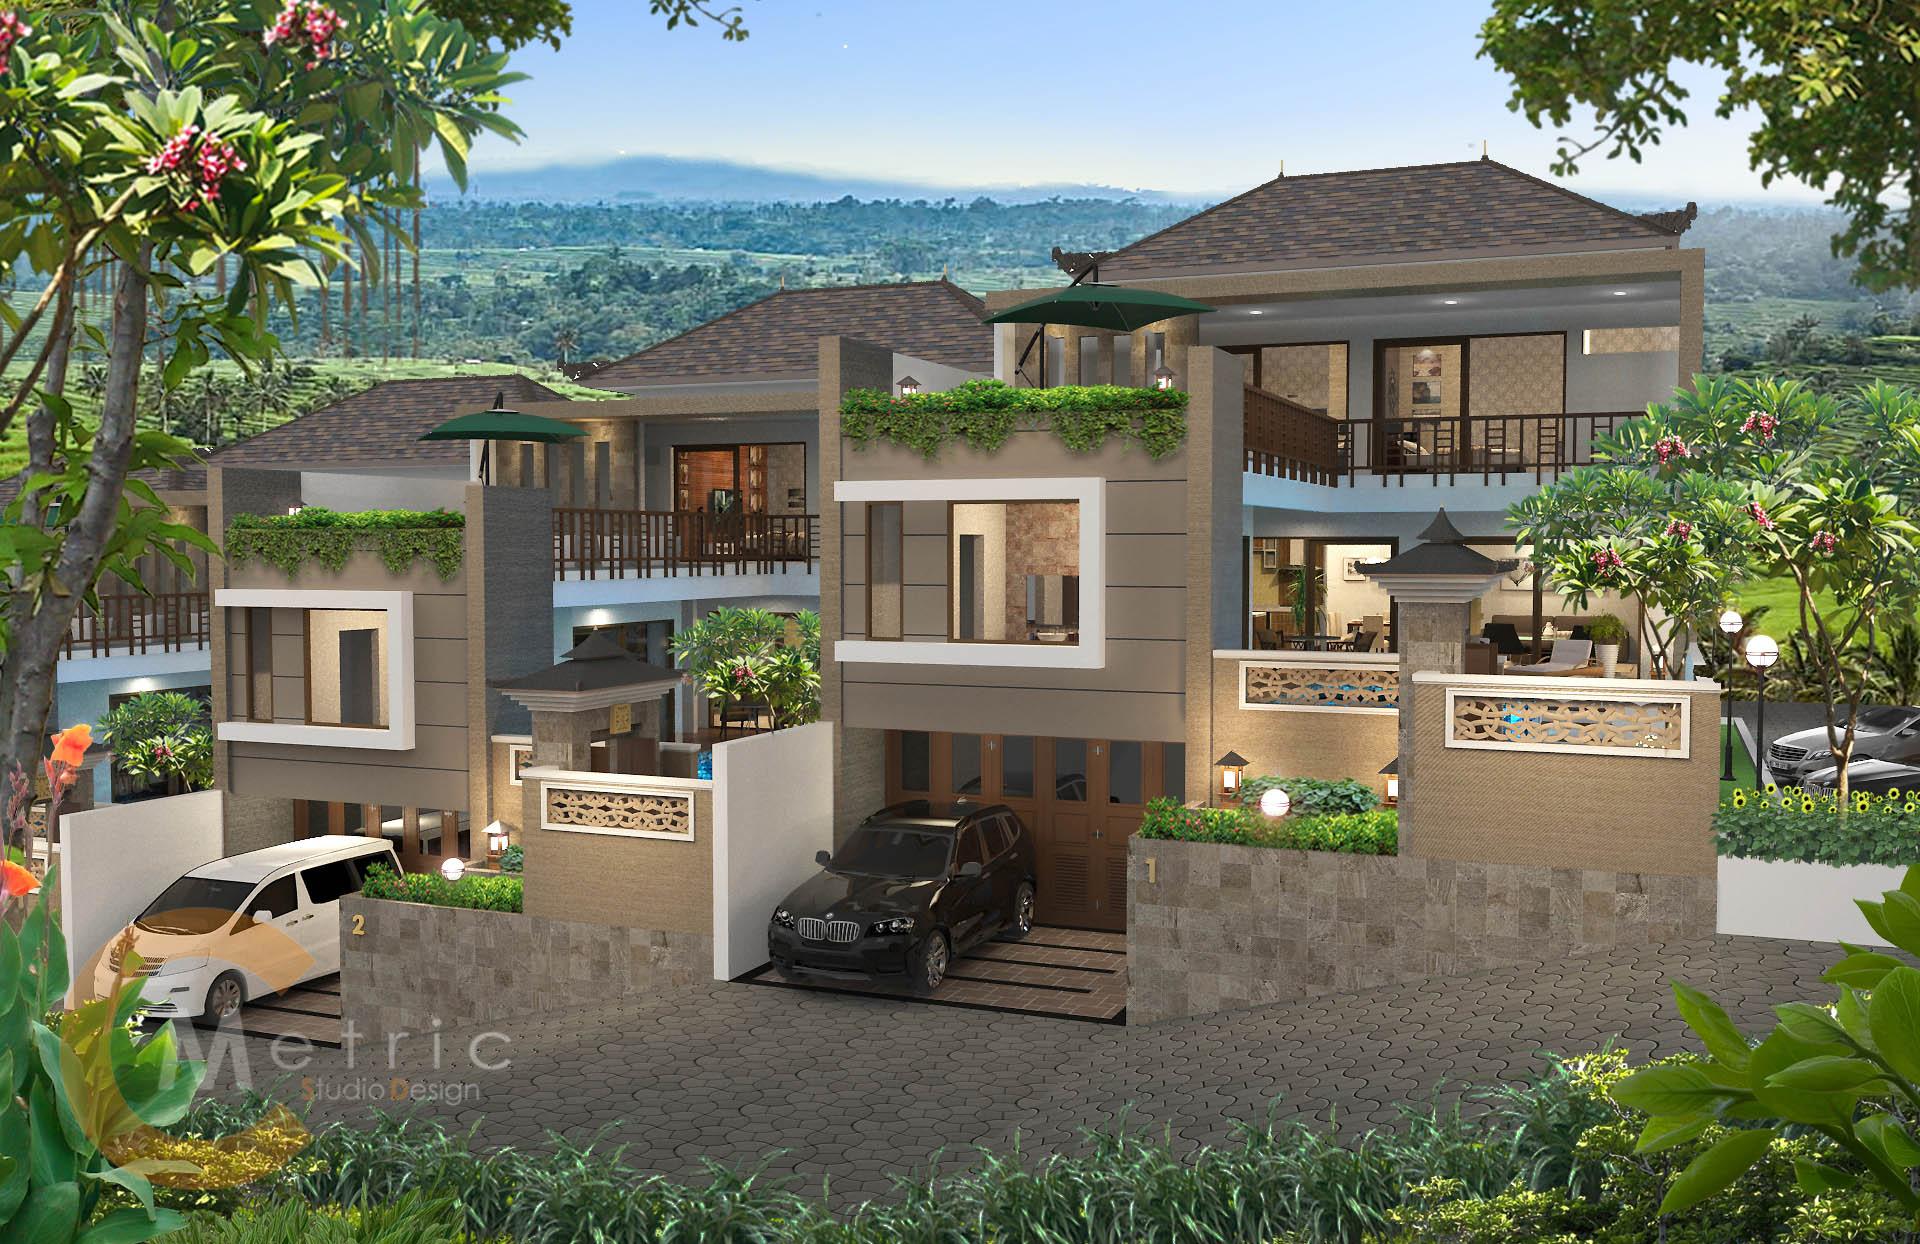 jasa 3d, desain 3d, gambar 3d, render 3d sketchup, interior arsitek (1)